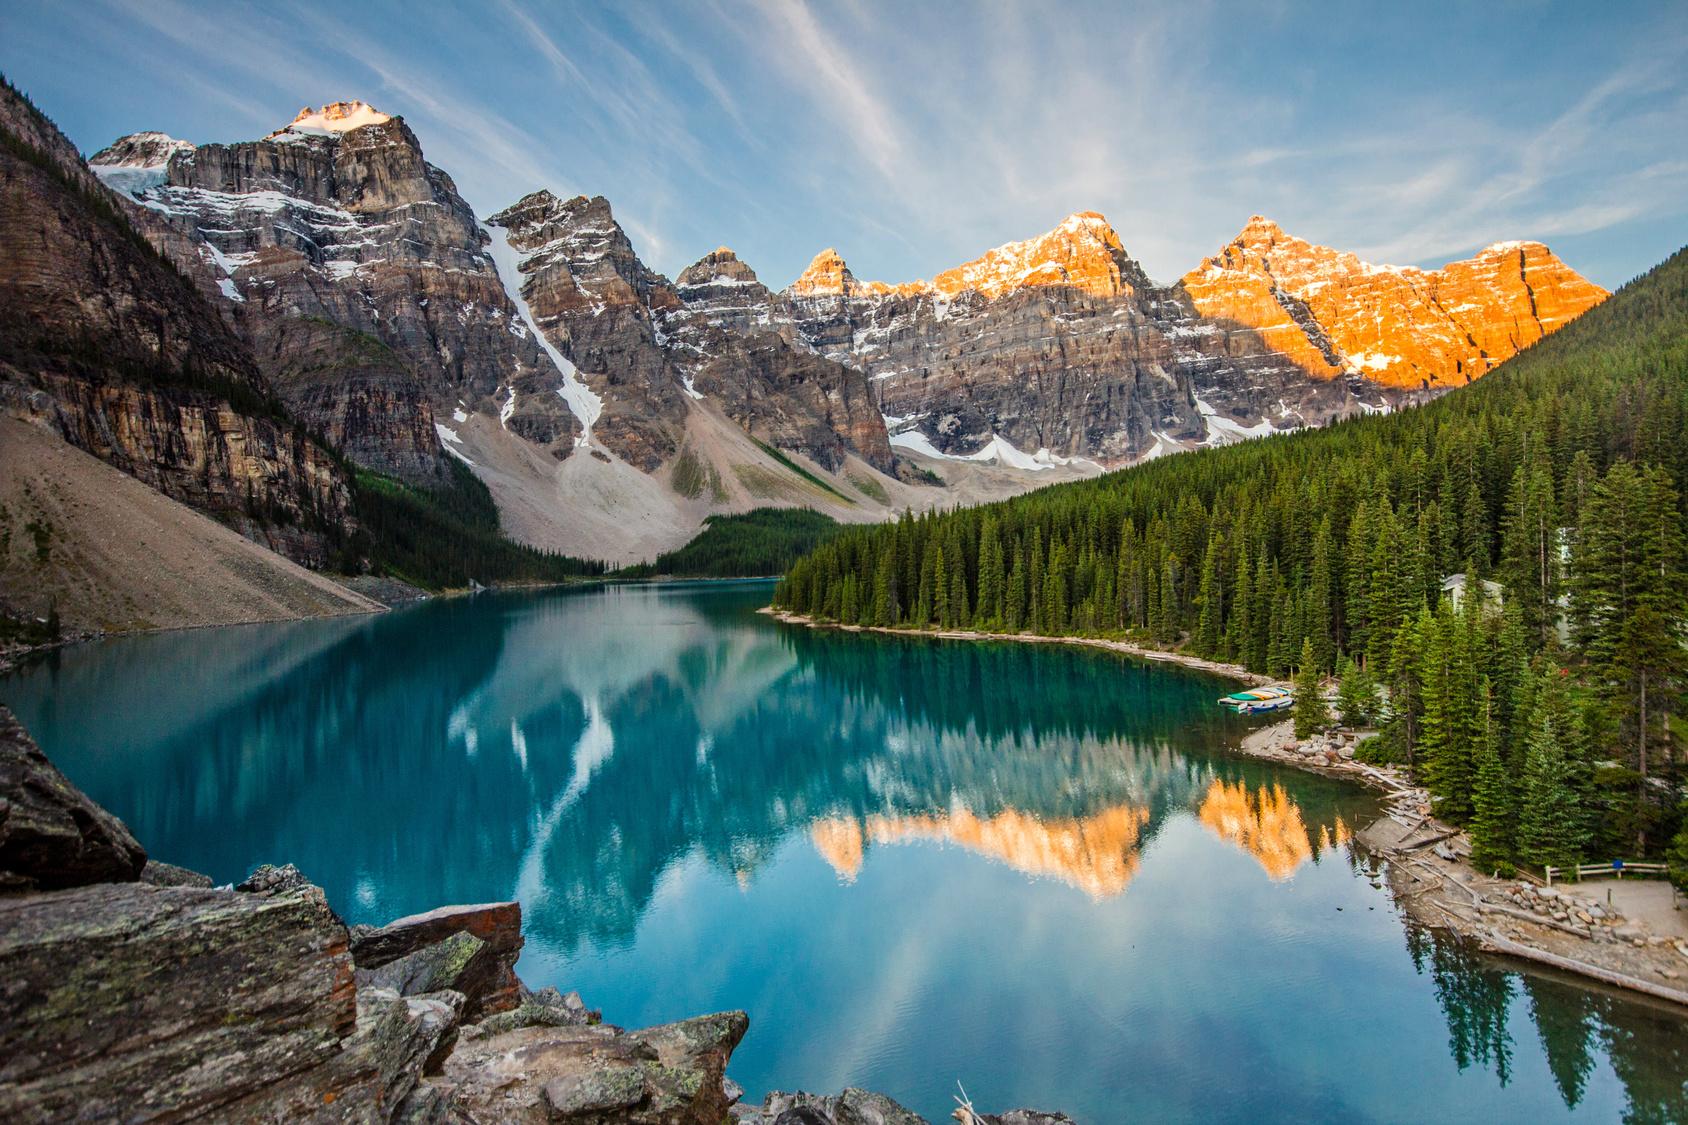 Top 5 Camping Sites in British Columbia